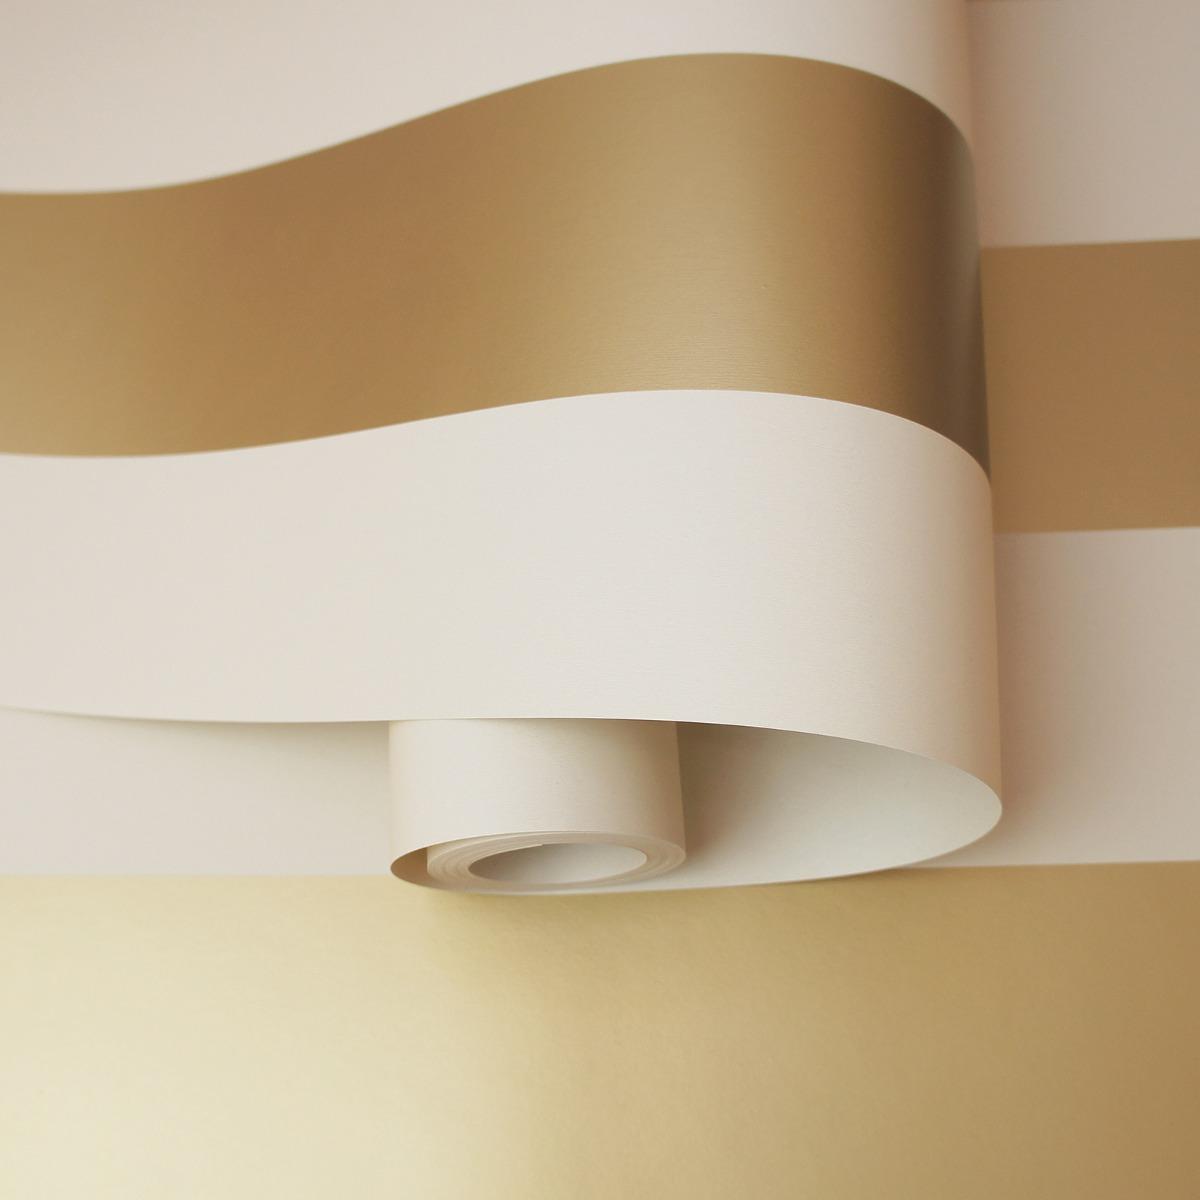 Dillan Stripe Wallpaper Cream / Gold Holden 12761